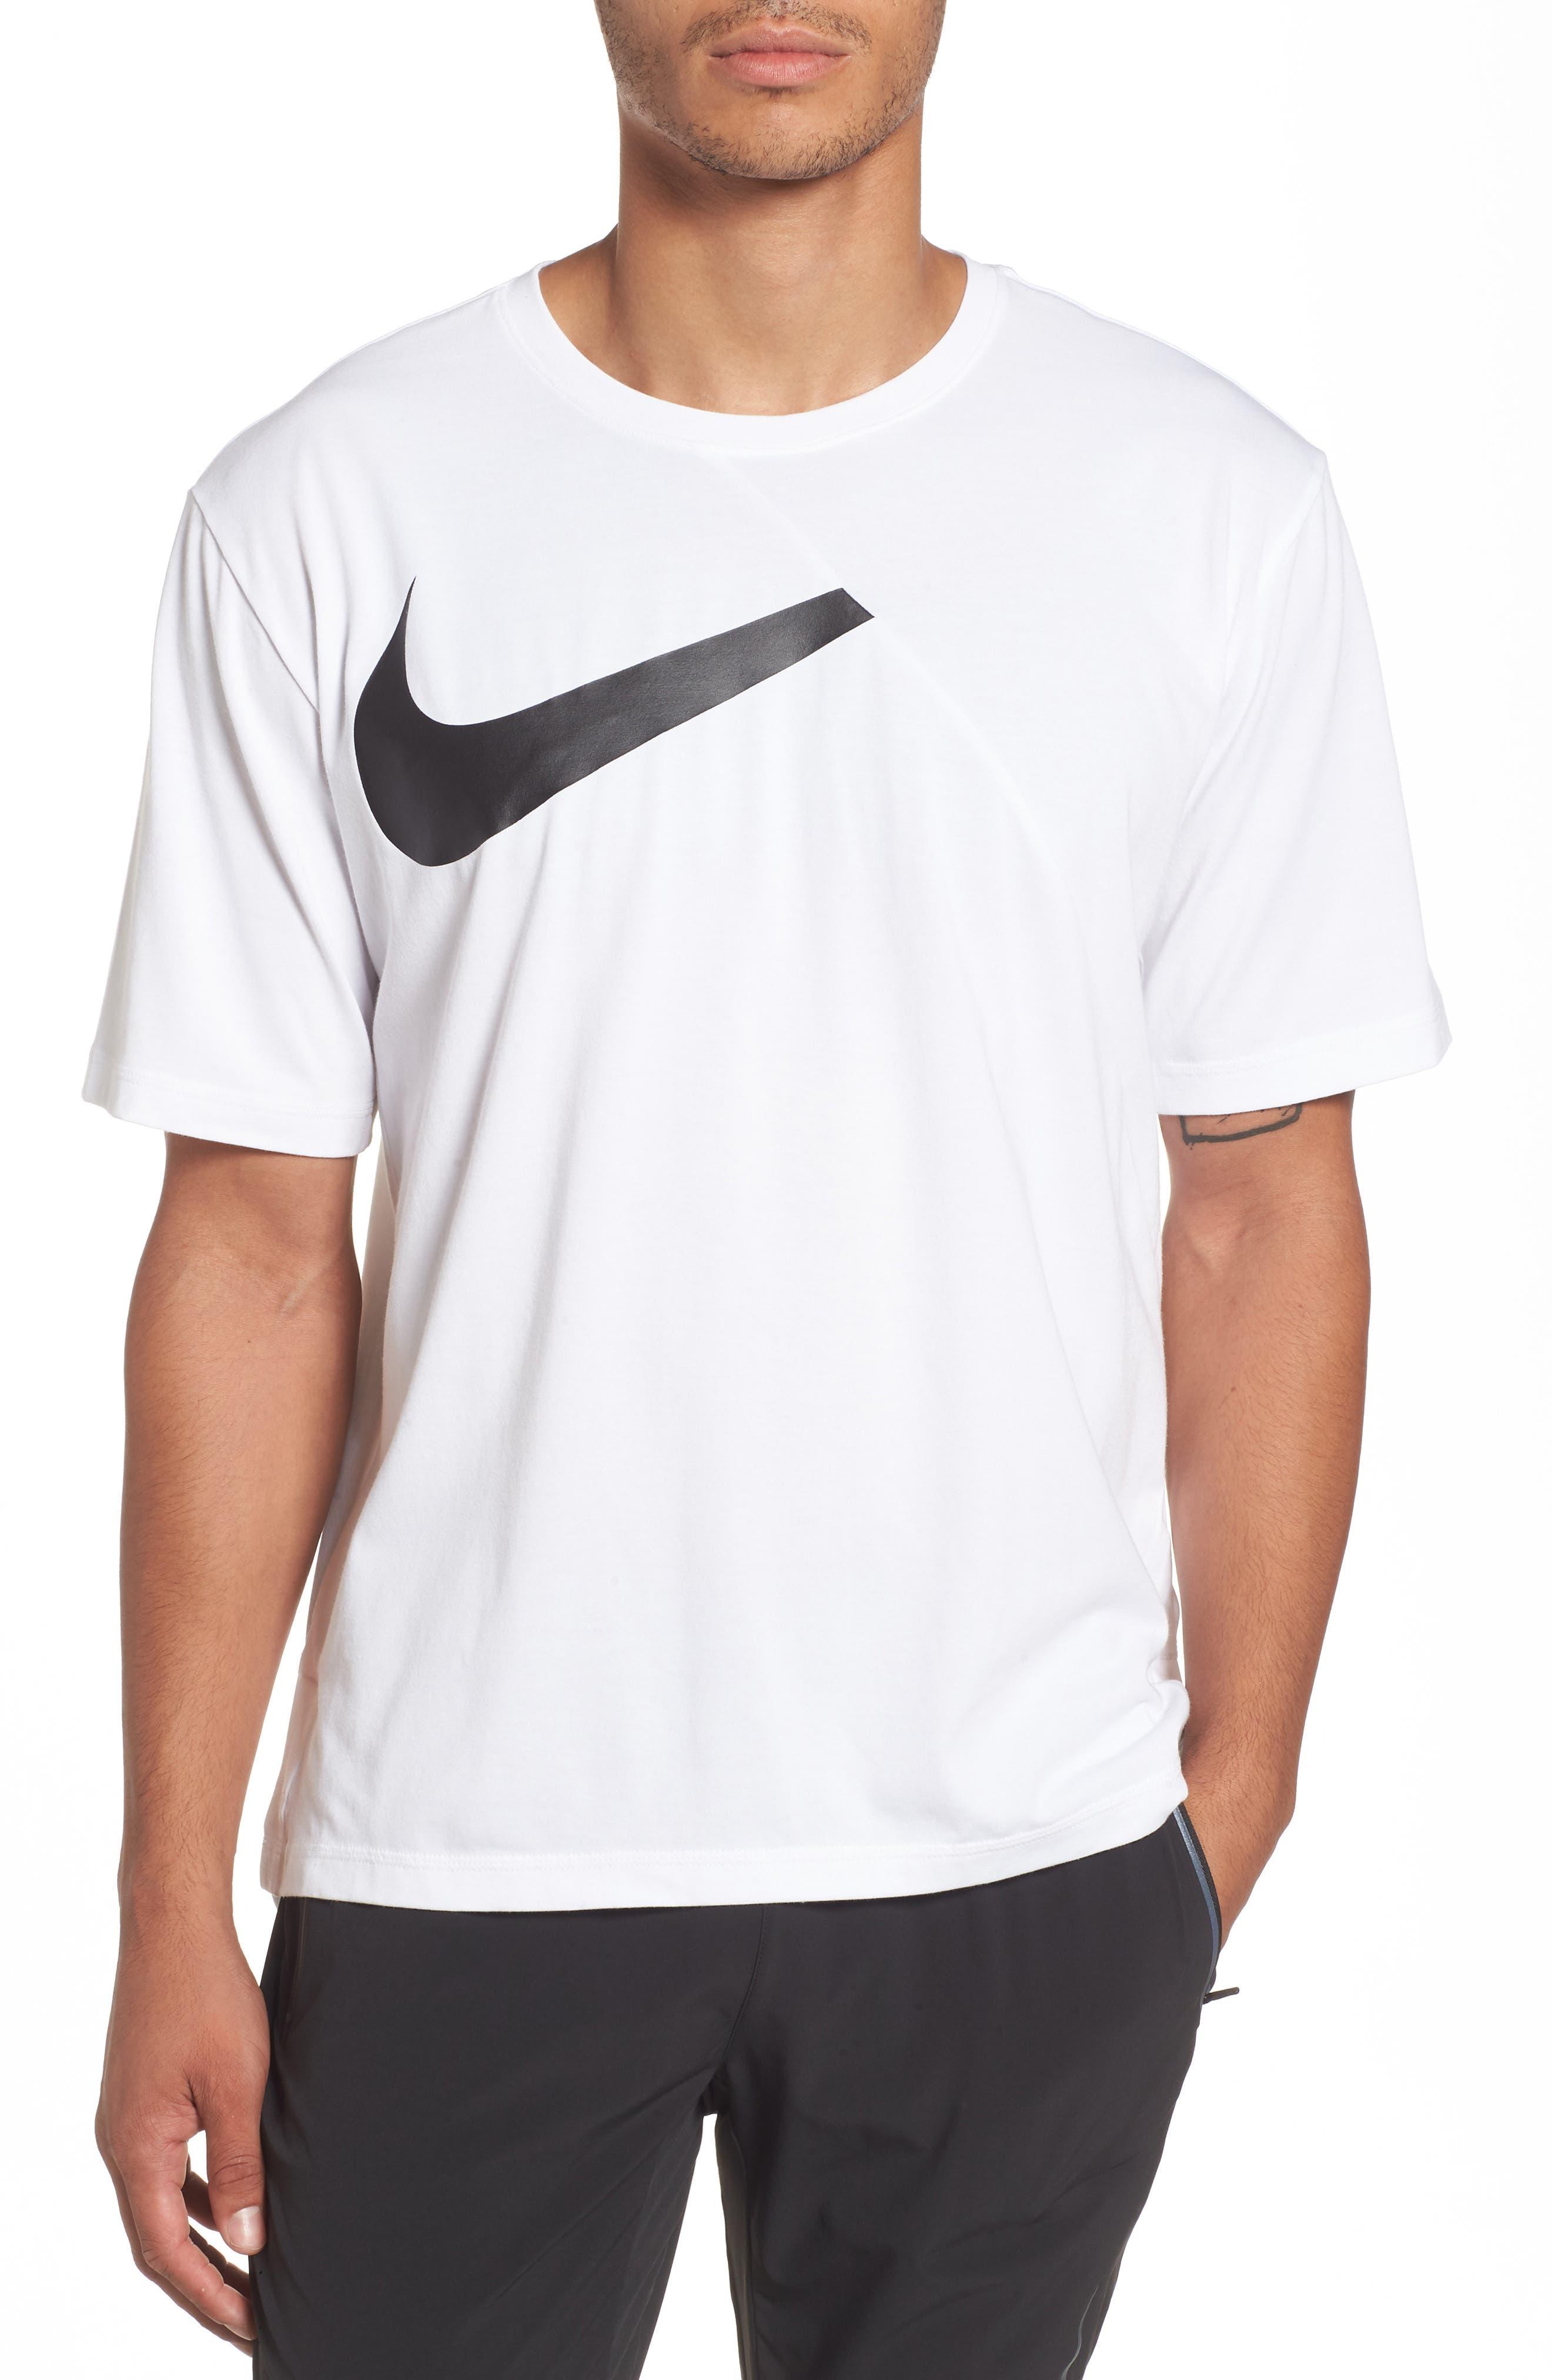 NIKE Dry Performance T-Shirt, Main, color, WHITE/ BLACK